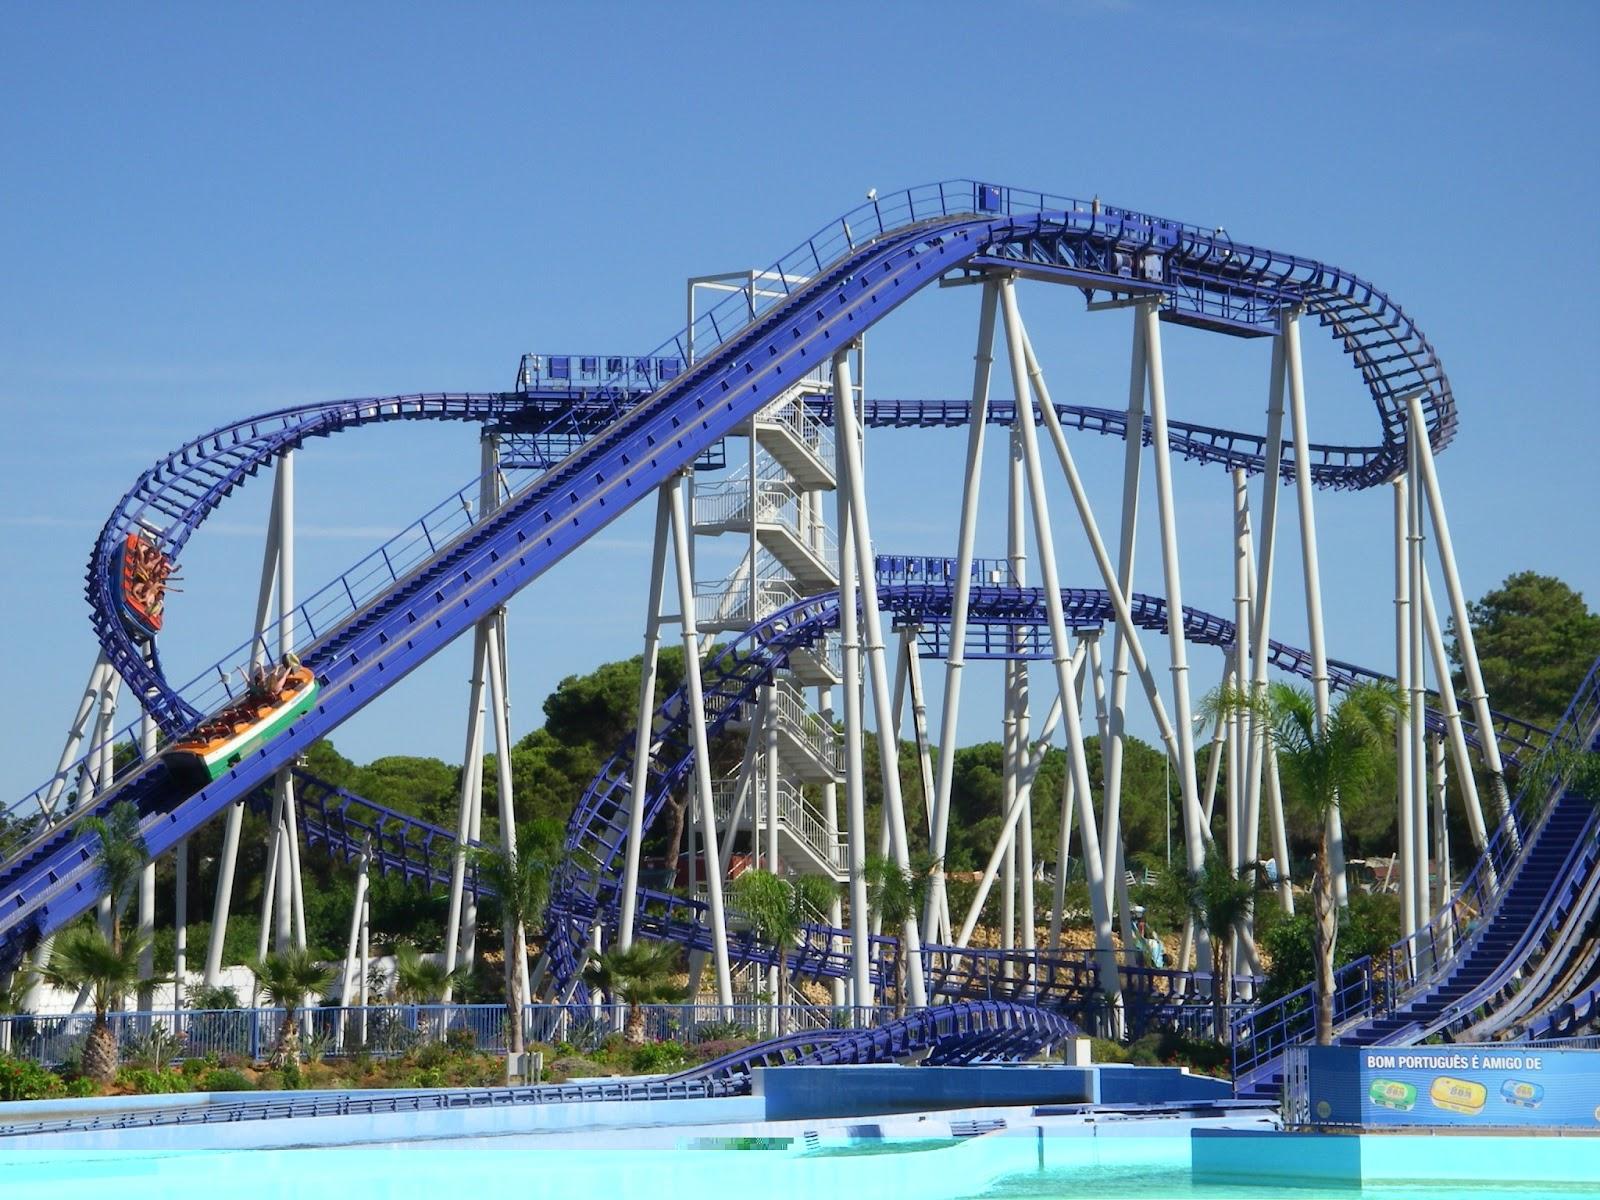 parc attraction 83